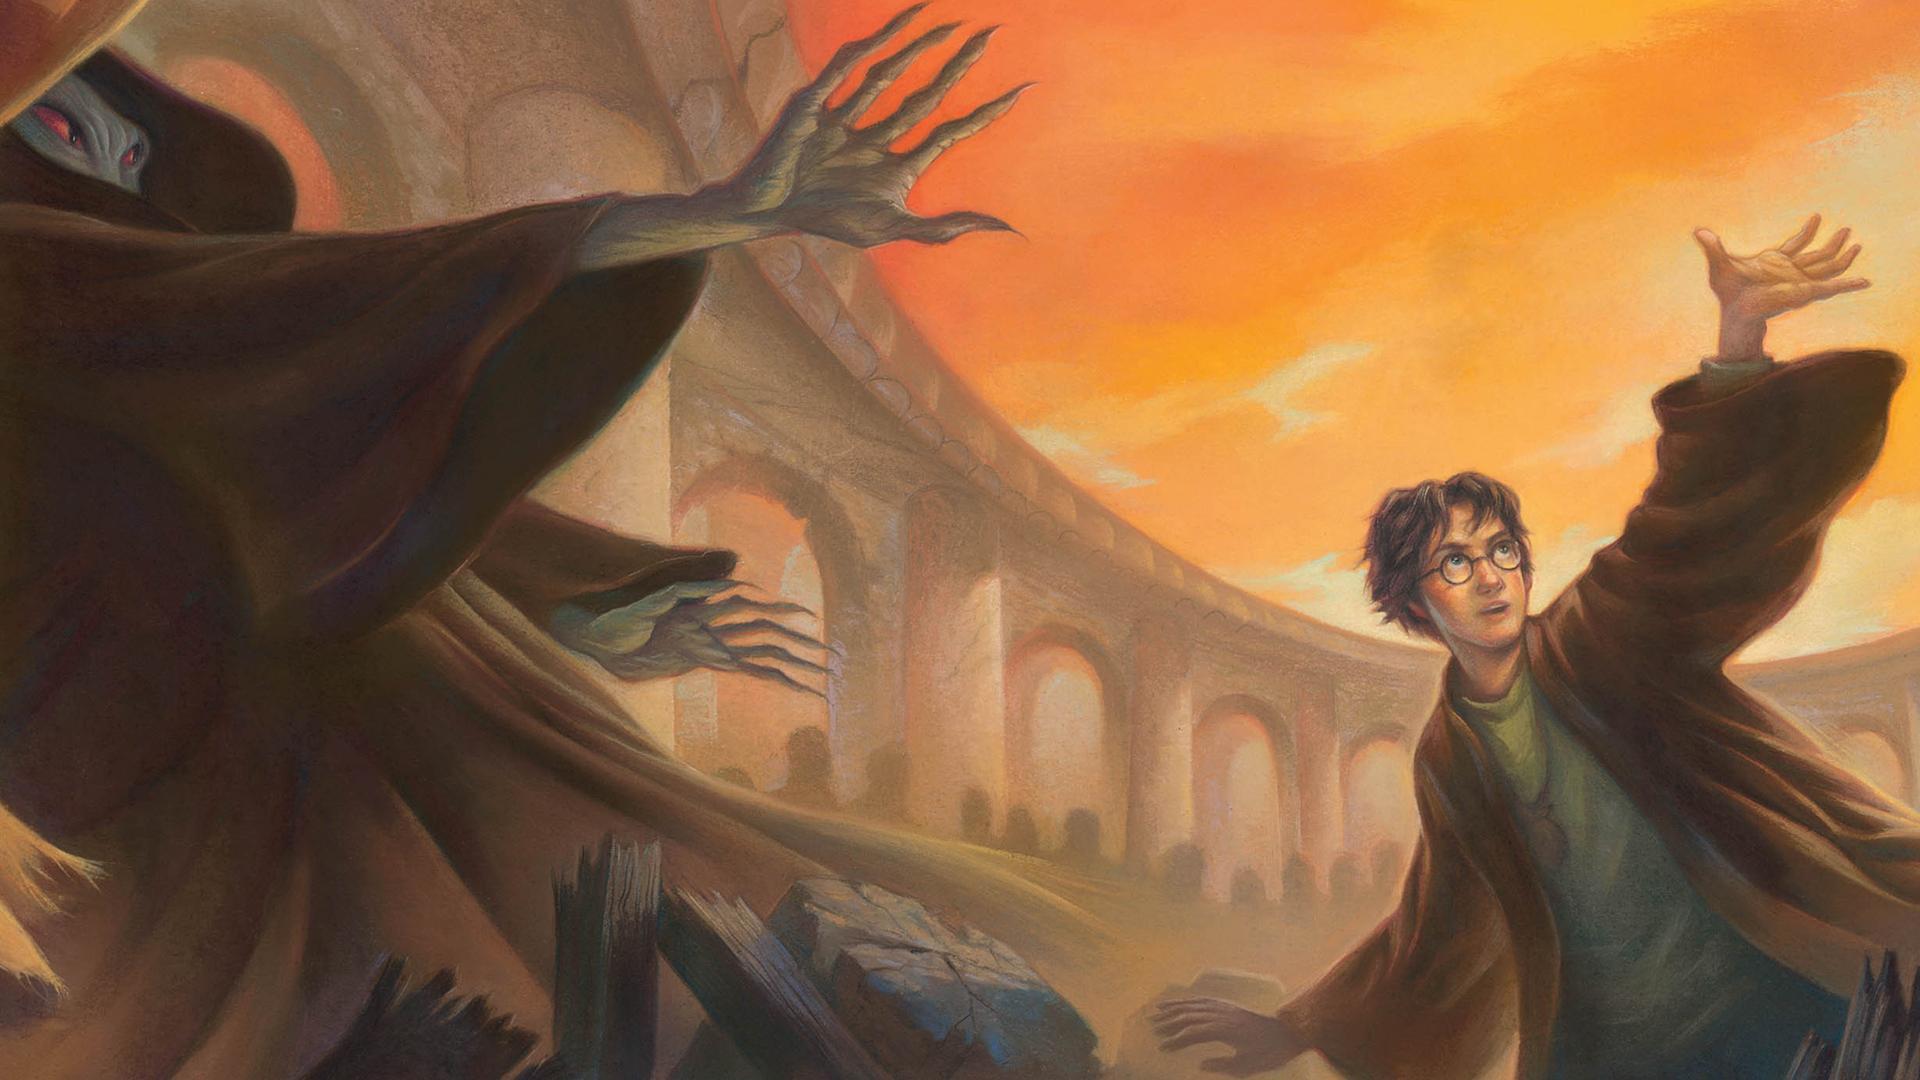 Harry Potter Full Covers 2290512 Hd Wallpaper